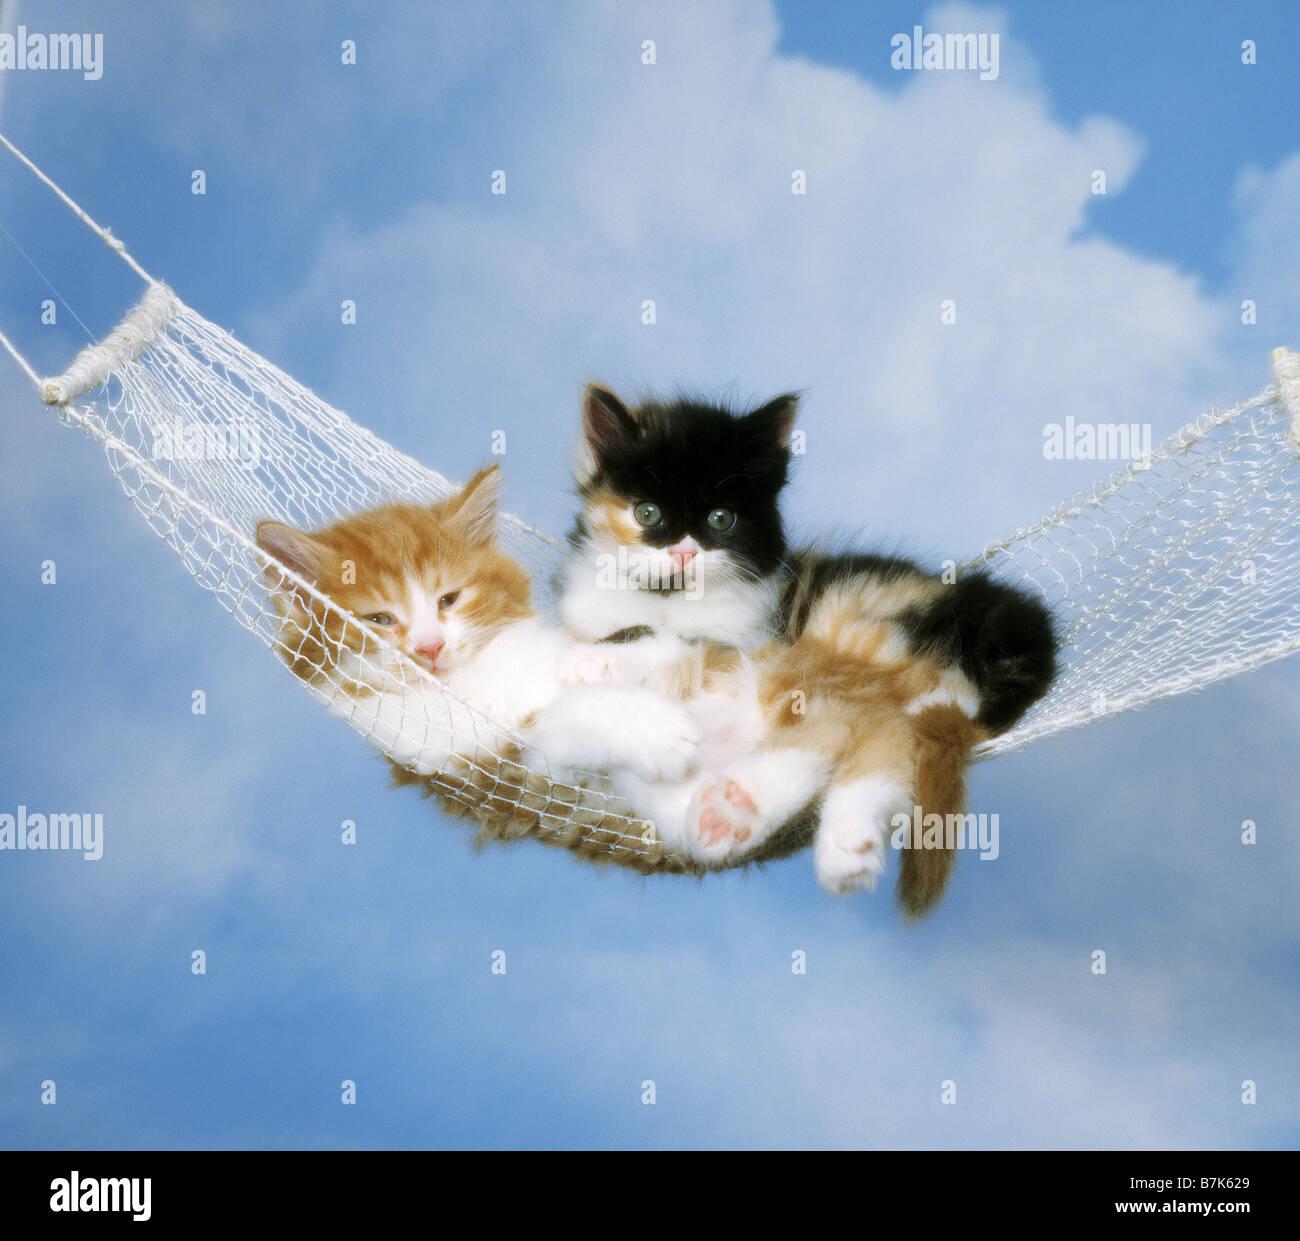 Two Angora Cat Kitten Lying In Hammock Stock Photo 21934817 Alamy